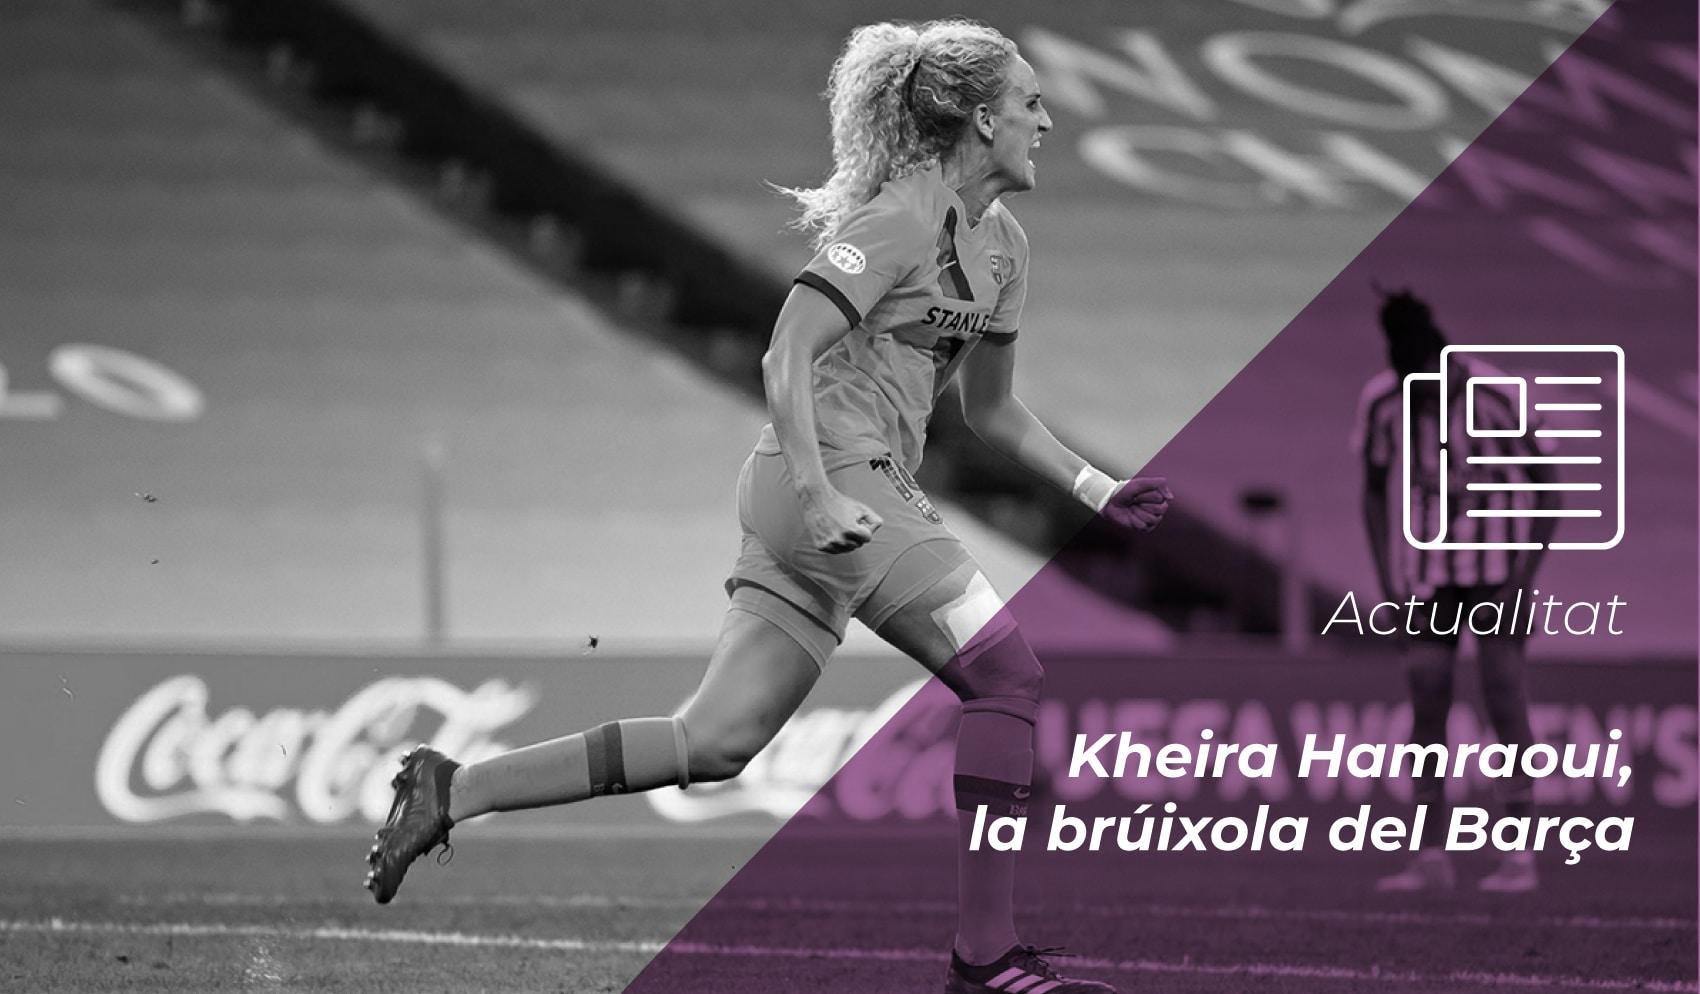 Kheira Hamraoui, la brúixola del Barça 1